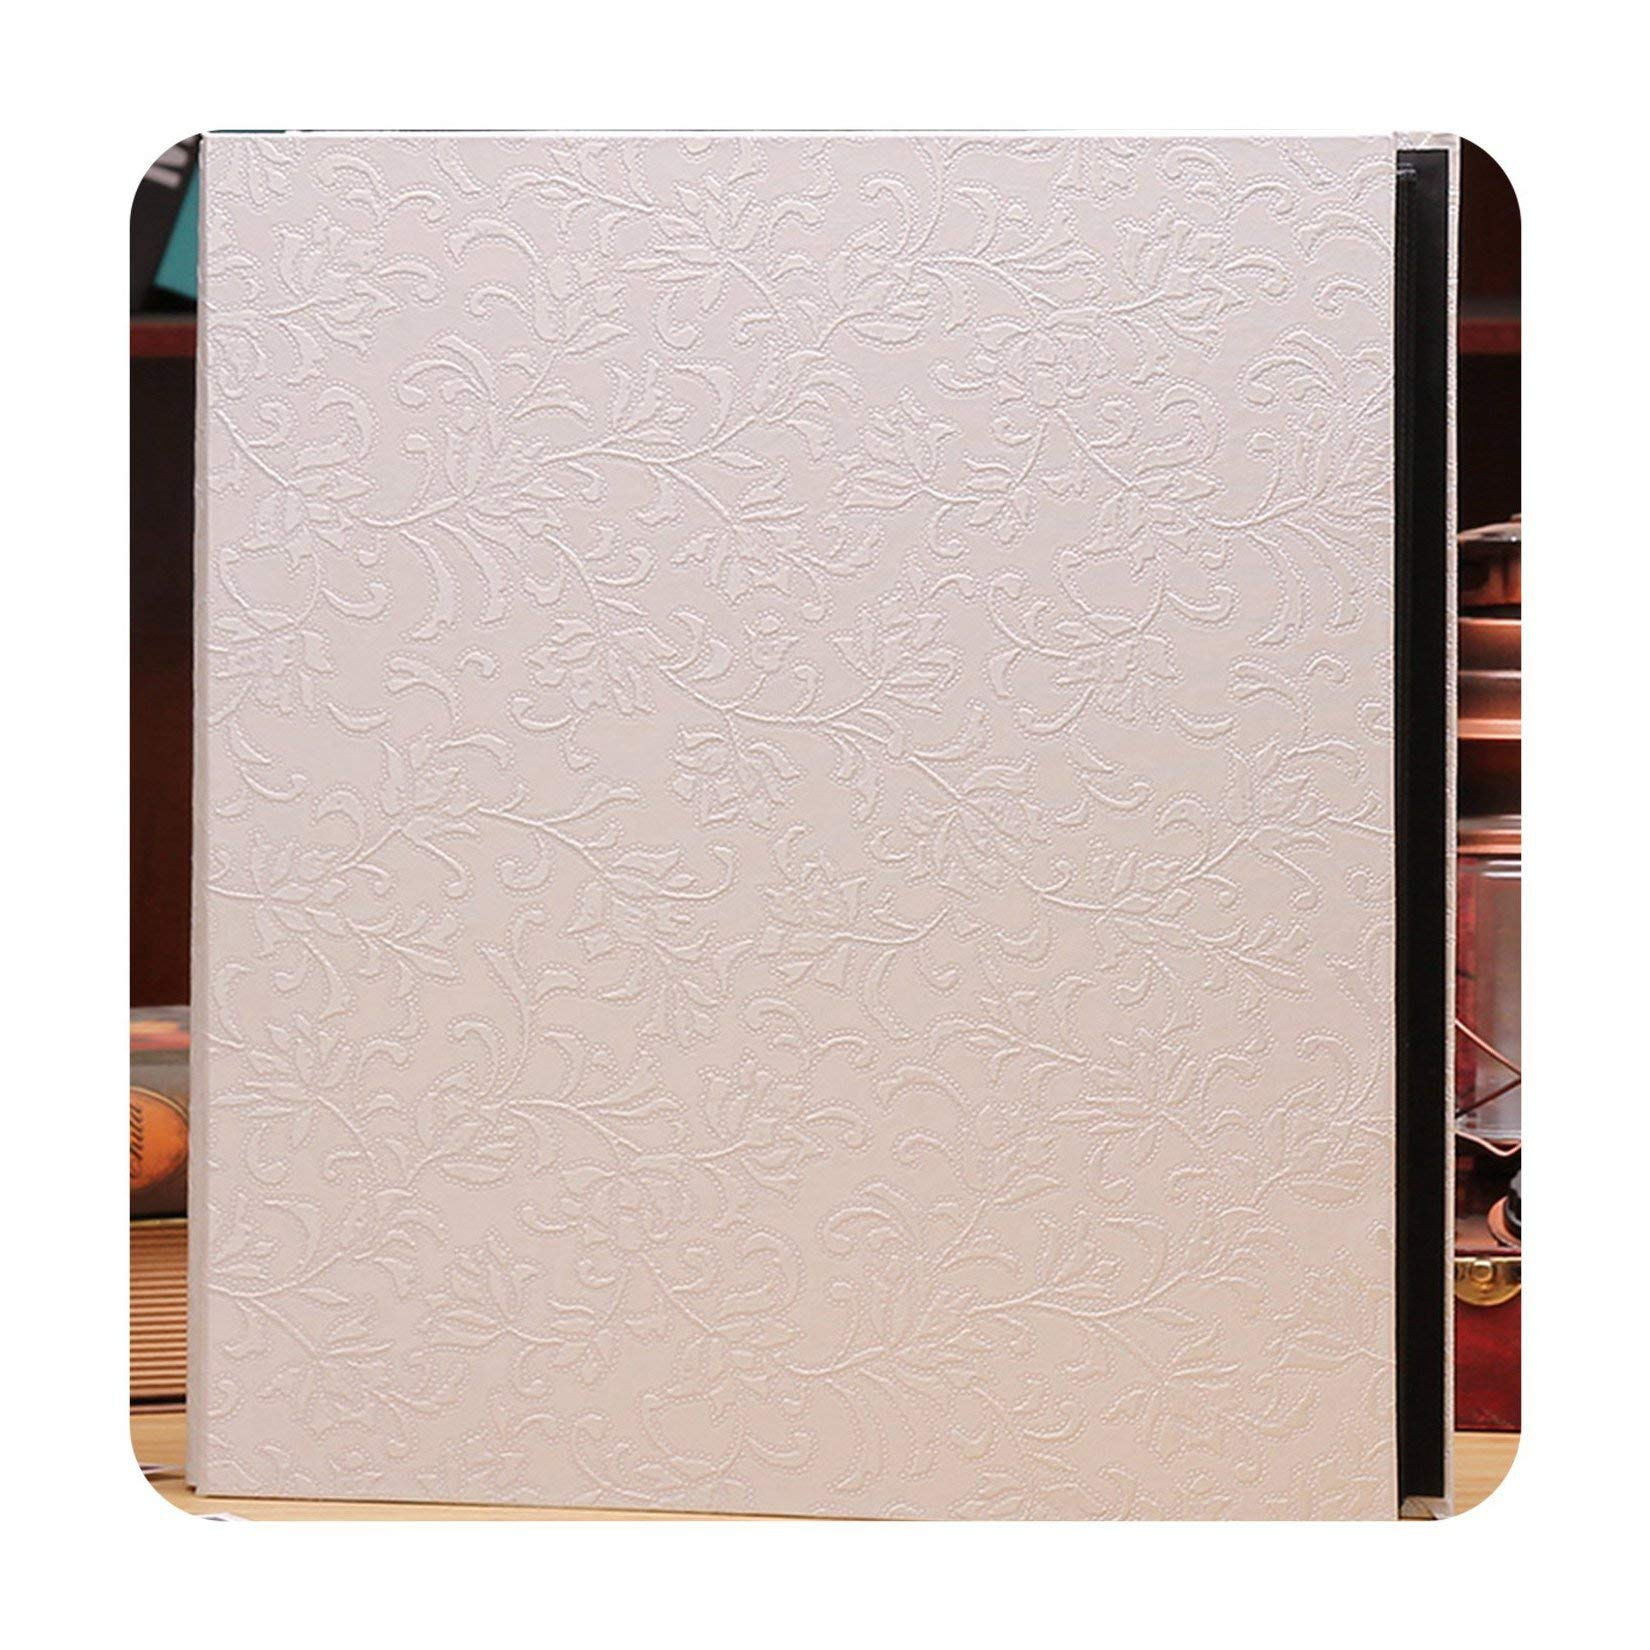 foosheeonzi 6 Inch 800 Plastic Pockets Photo Album Family Insert Large Capacity Leather Cover Gallery Family Memory Record Scrapbook Album,3 by foosheeonzi (Image #1)